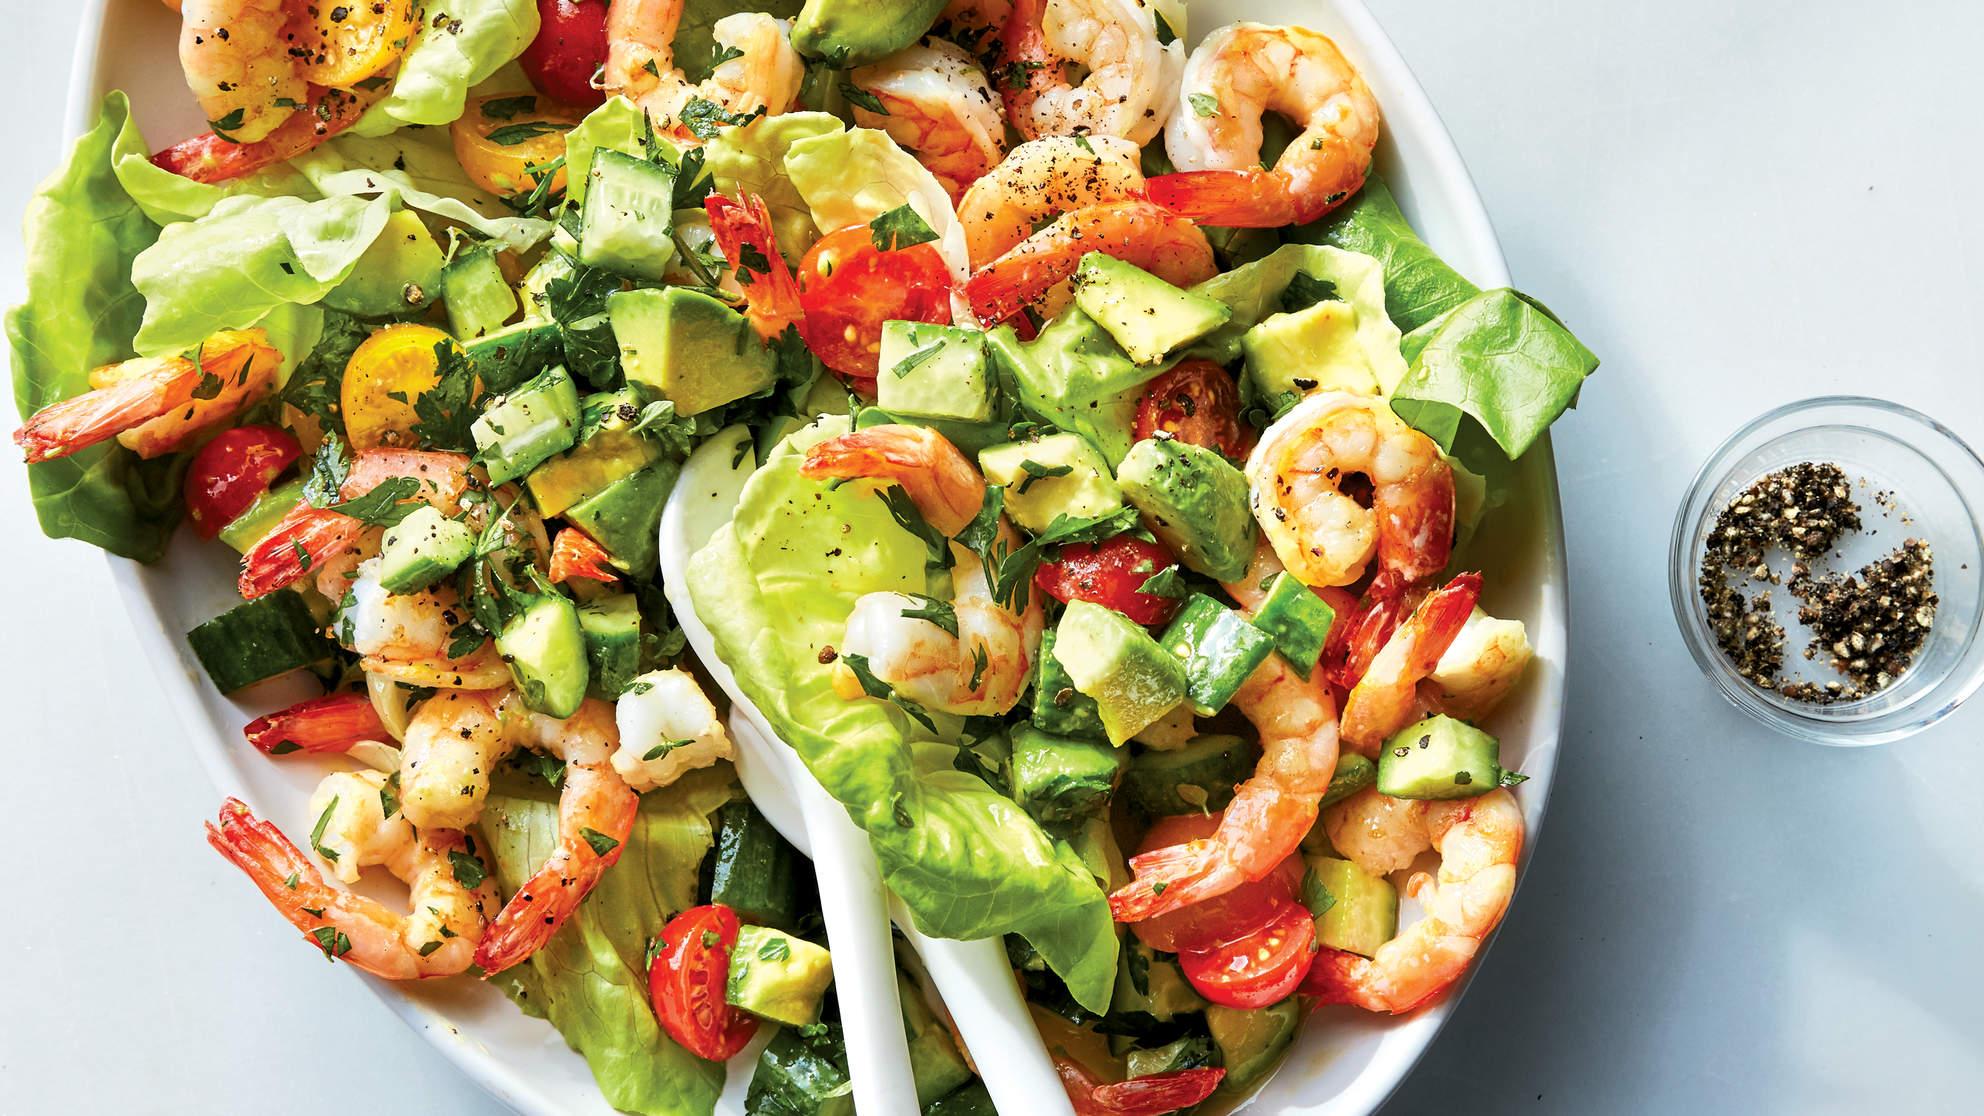 Shrimp Avocado Tomato Salad